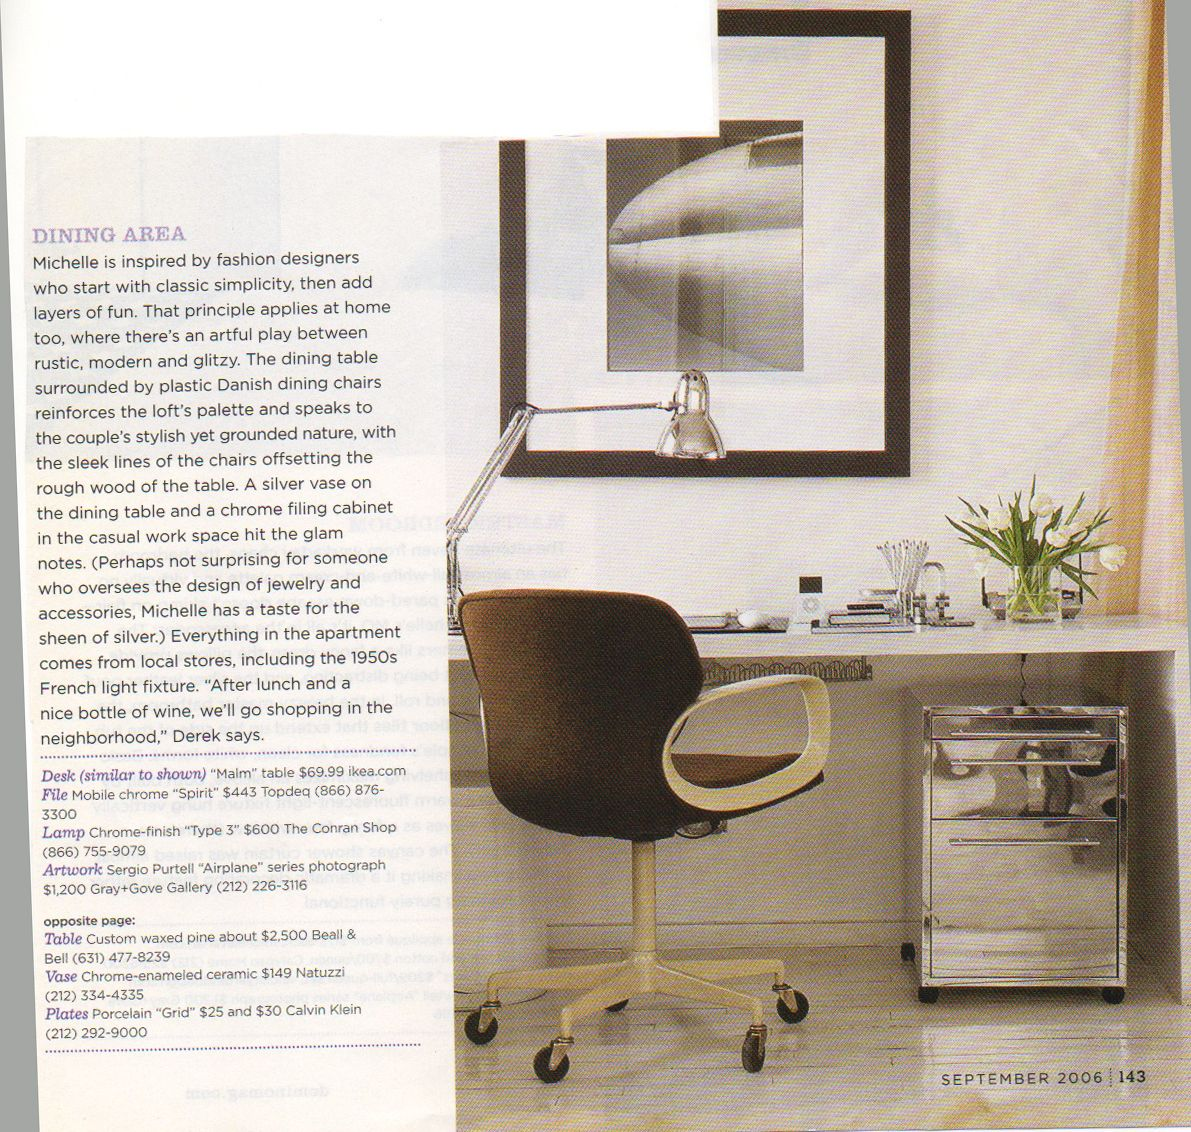 topdeq office furniture. Topdeq Office Furniture. Ikea Malm Table, Chrome Filing Cabinet From Topdeq, Lamp Conran Furniture I